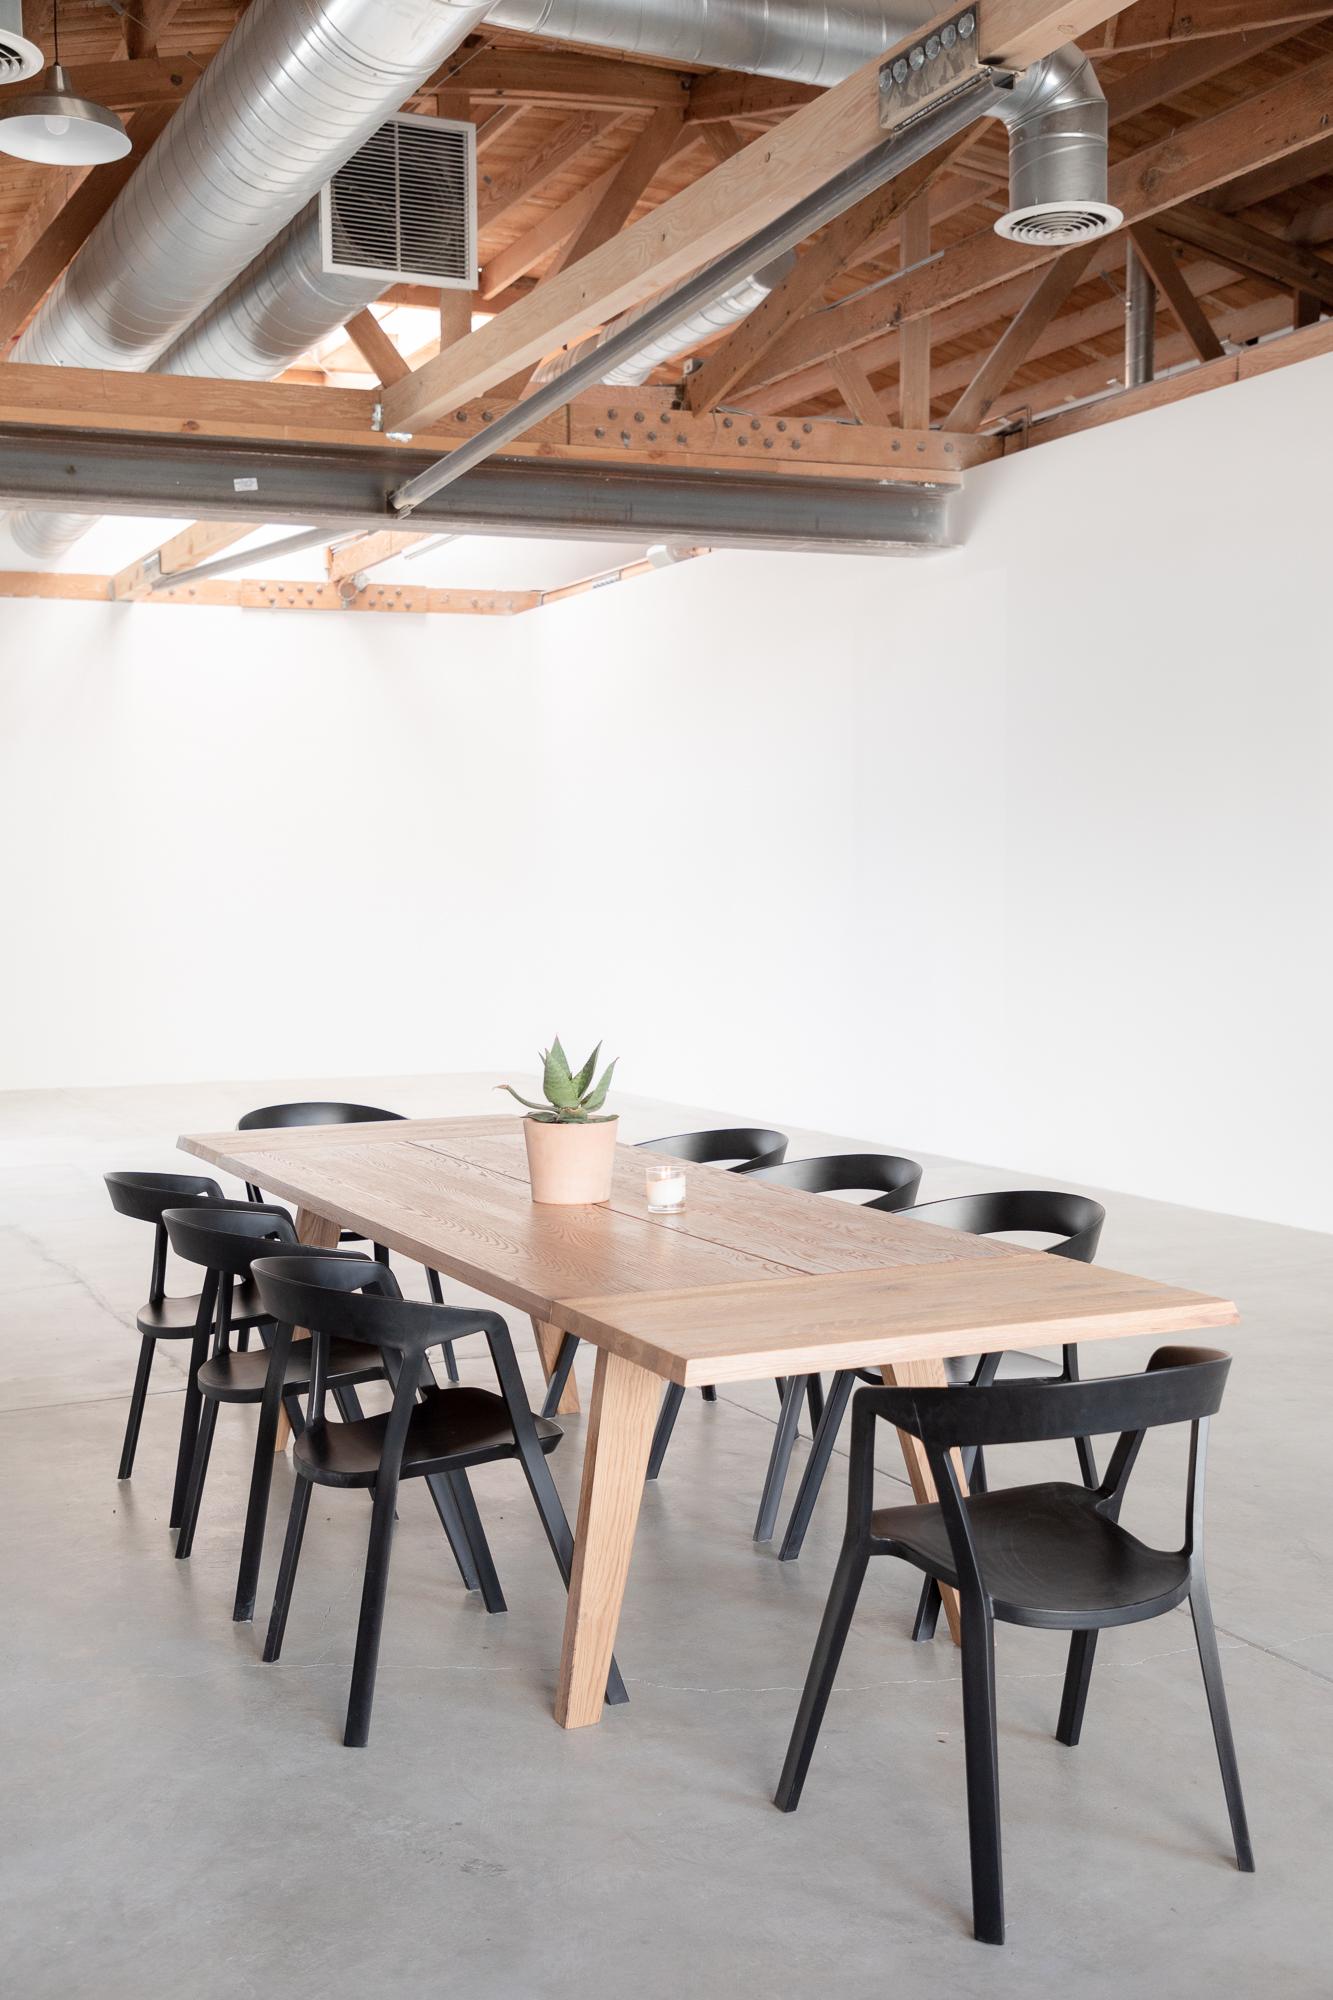 LME_Studios_Table.jpg